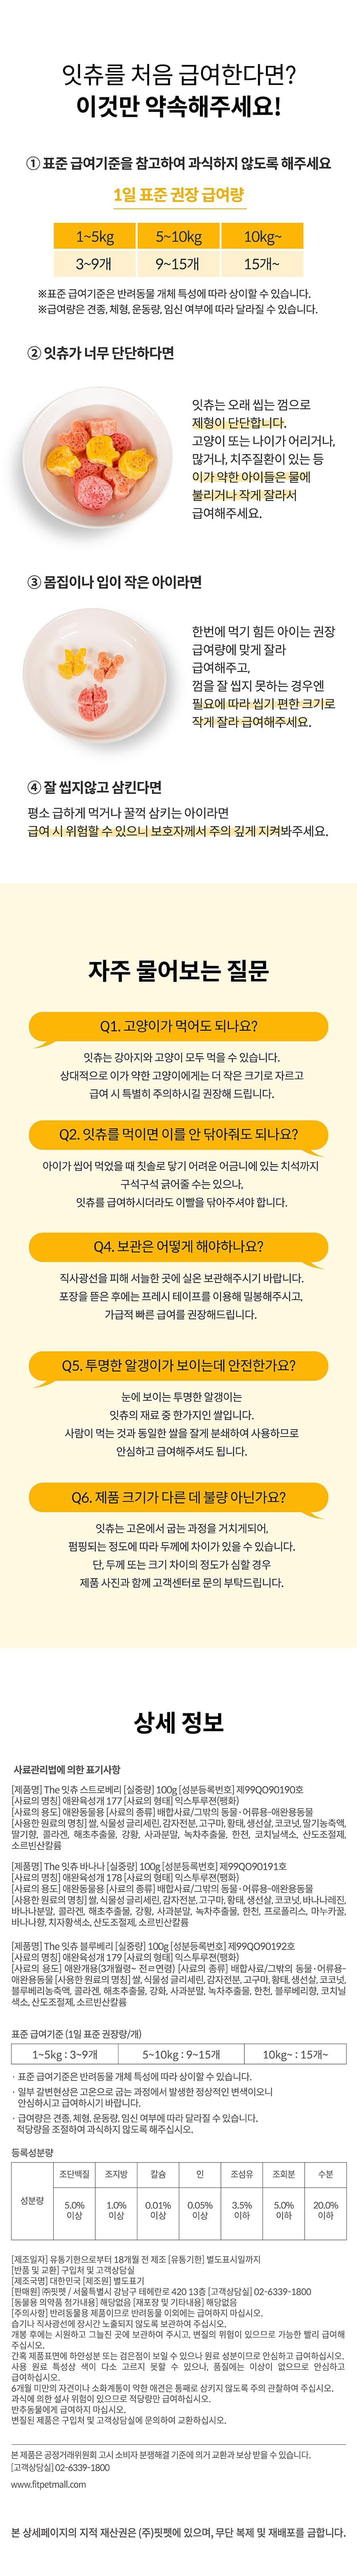 [EVENT] it 잇츄 디즈니 (블루베리)-상품이미지-8